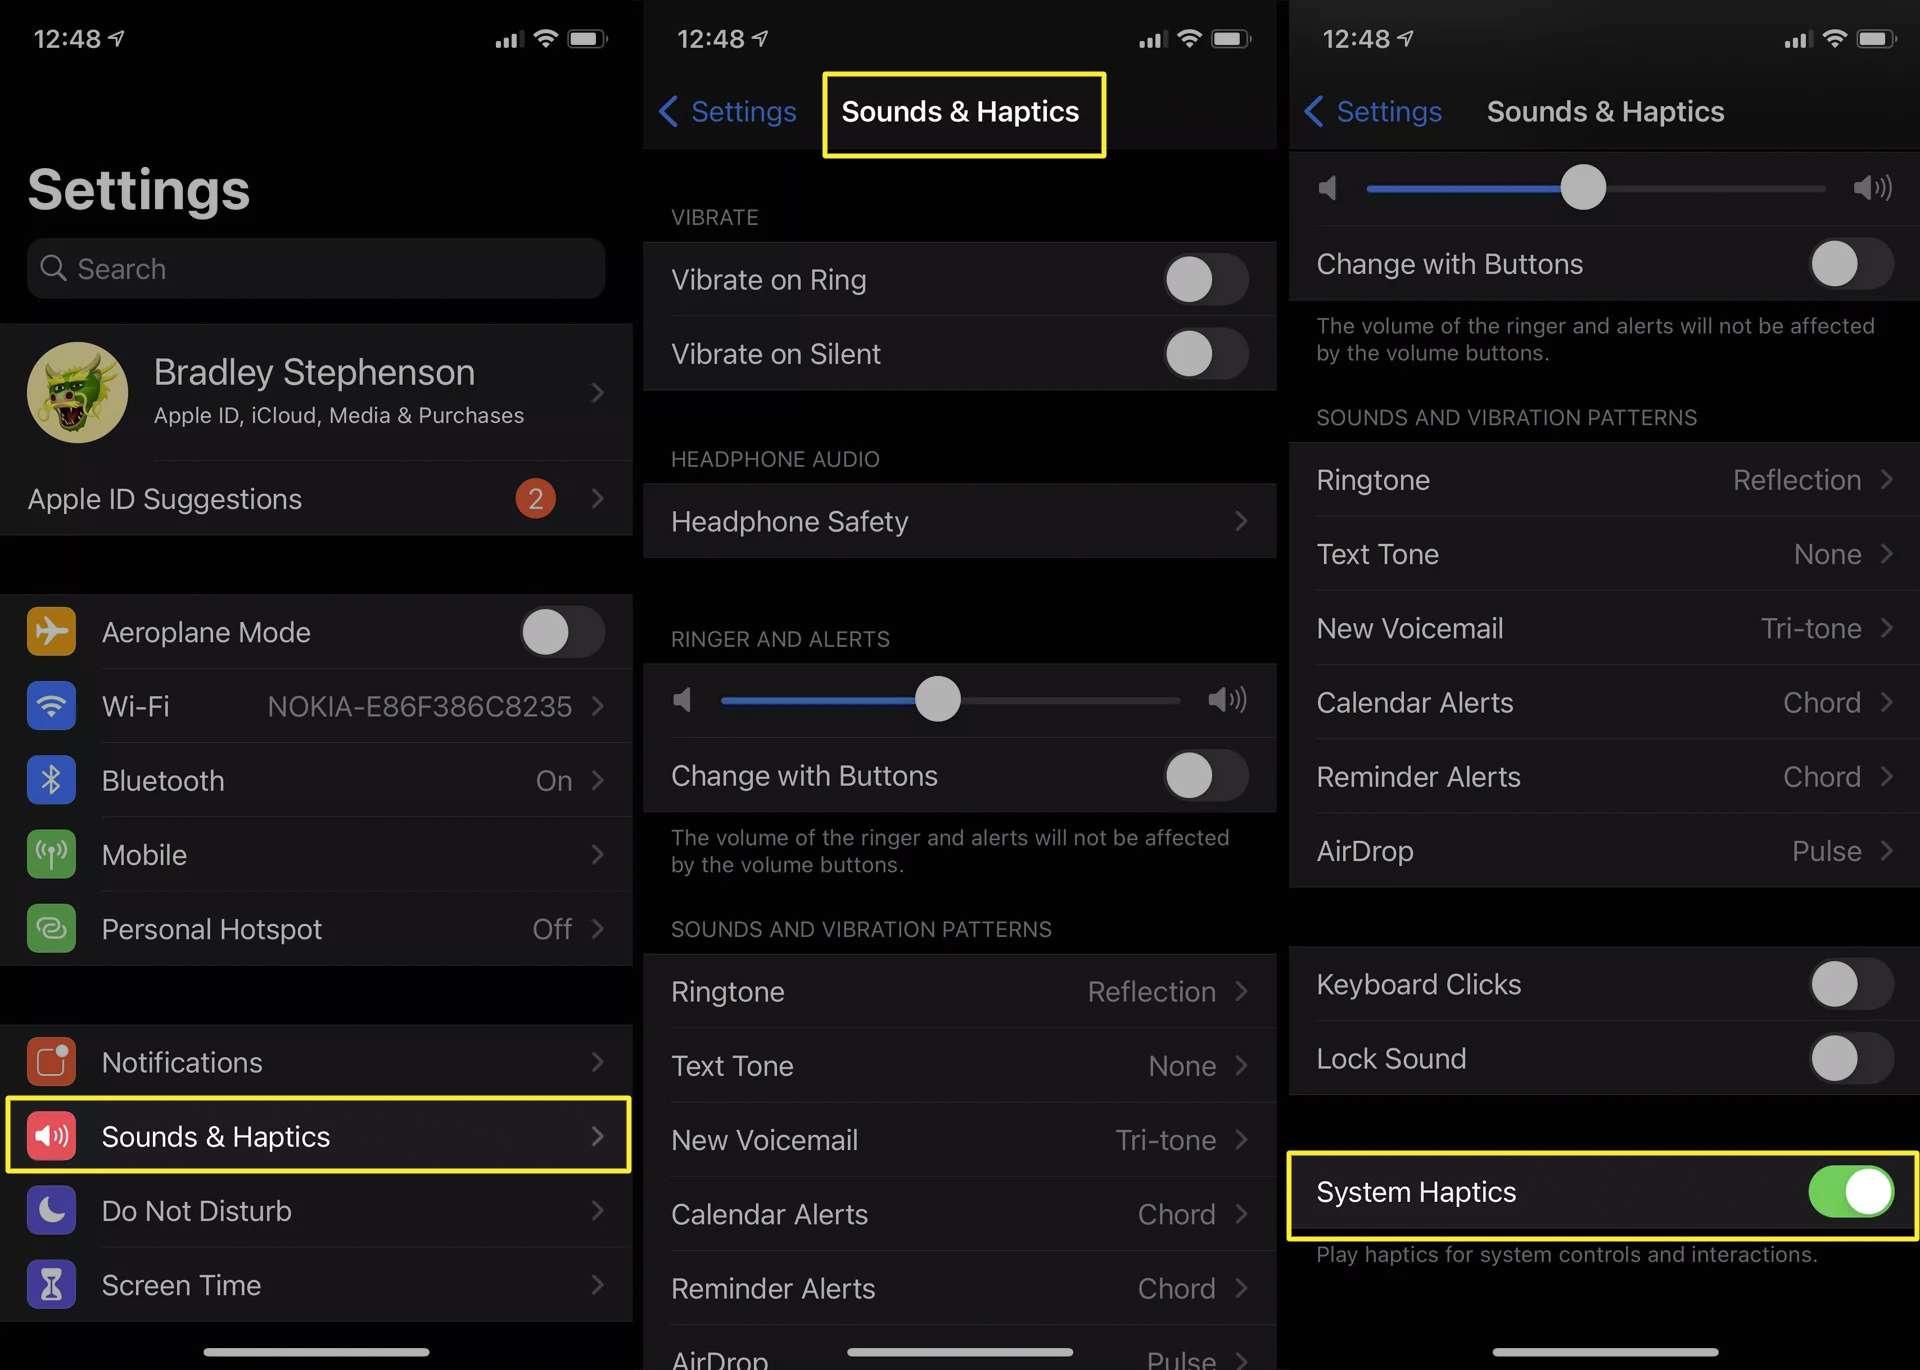 iOS haptic feedback vibration settings on iPhone.